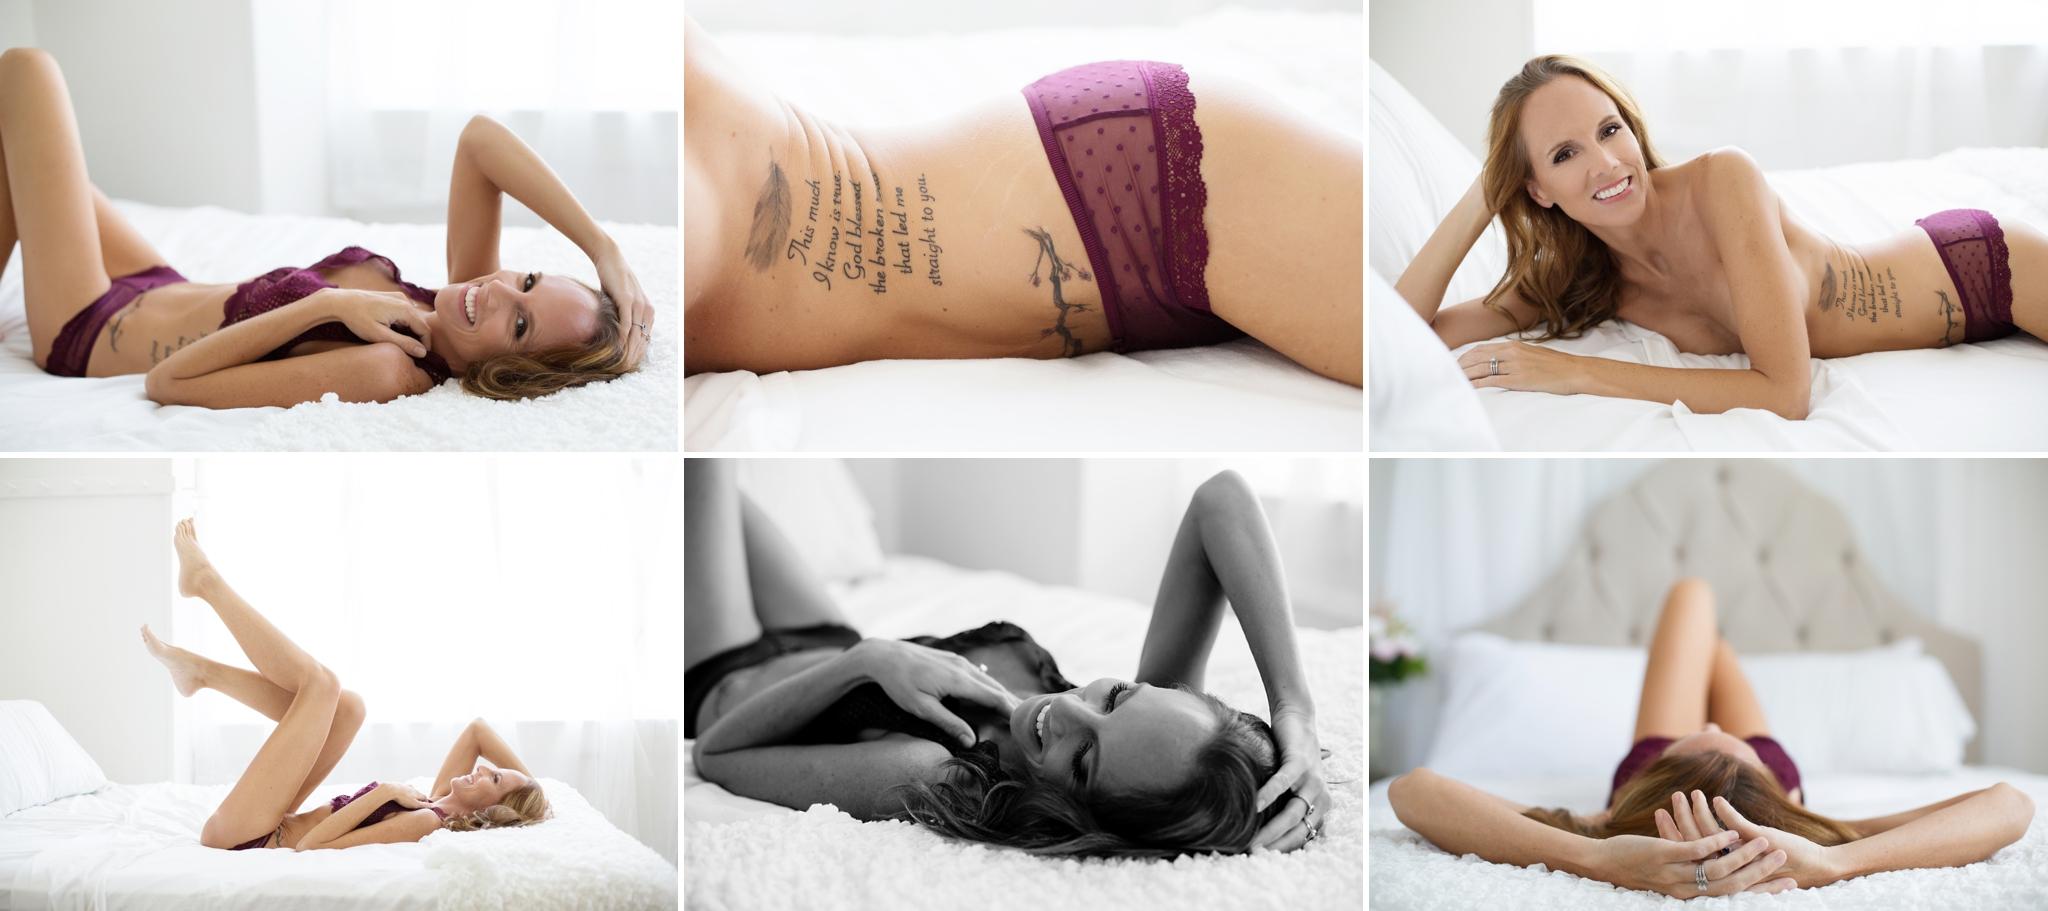 Sasha Dale Photography, surrogate mother, boudoir portraits, tattood girls